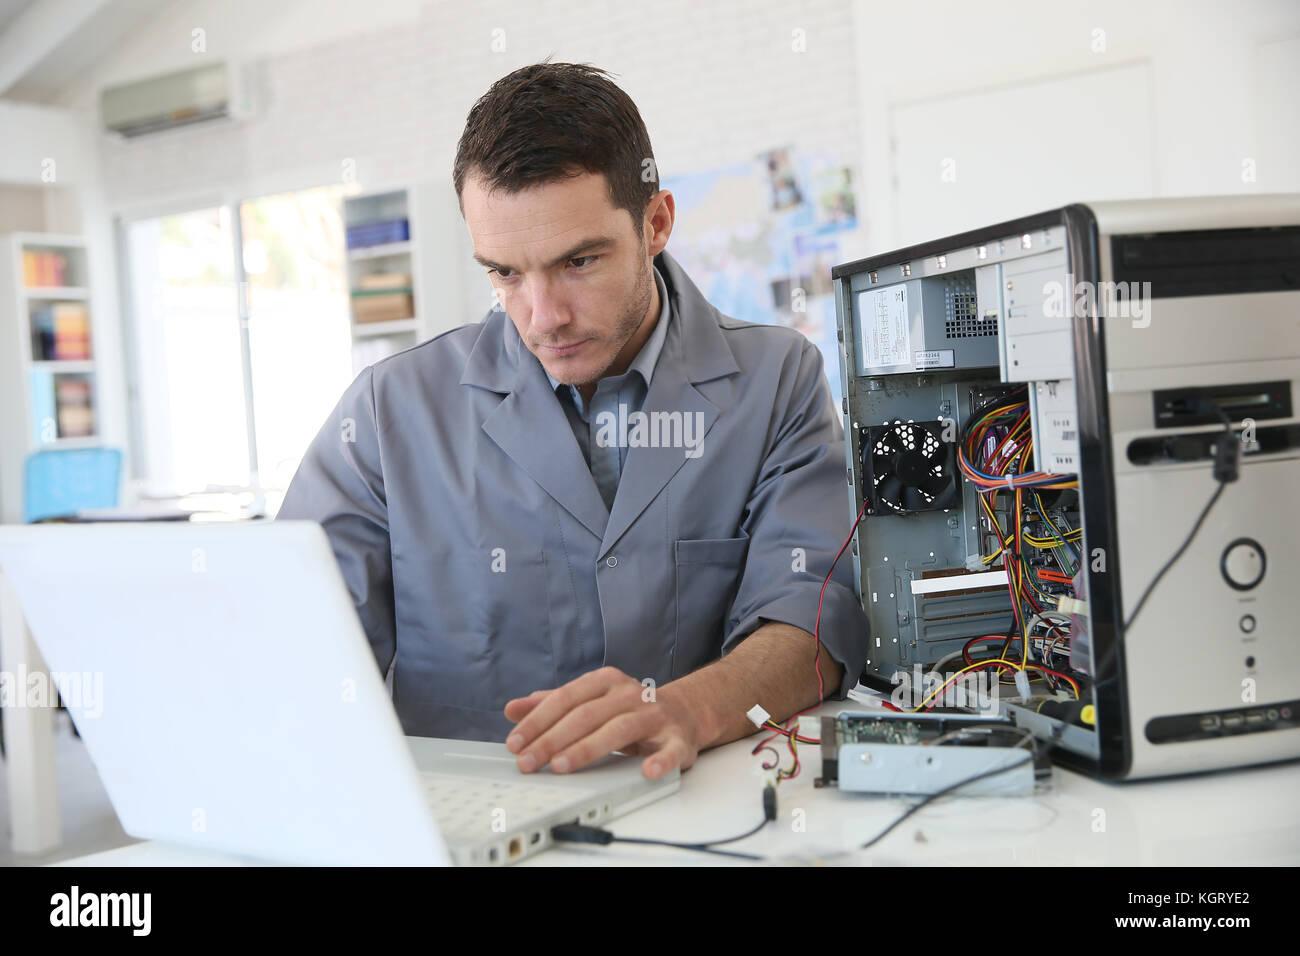 Technician fixing computer hardware - Stock Image